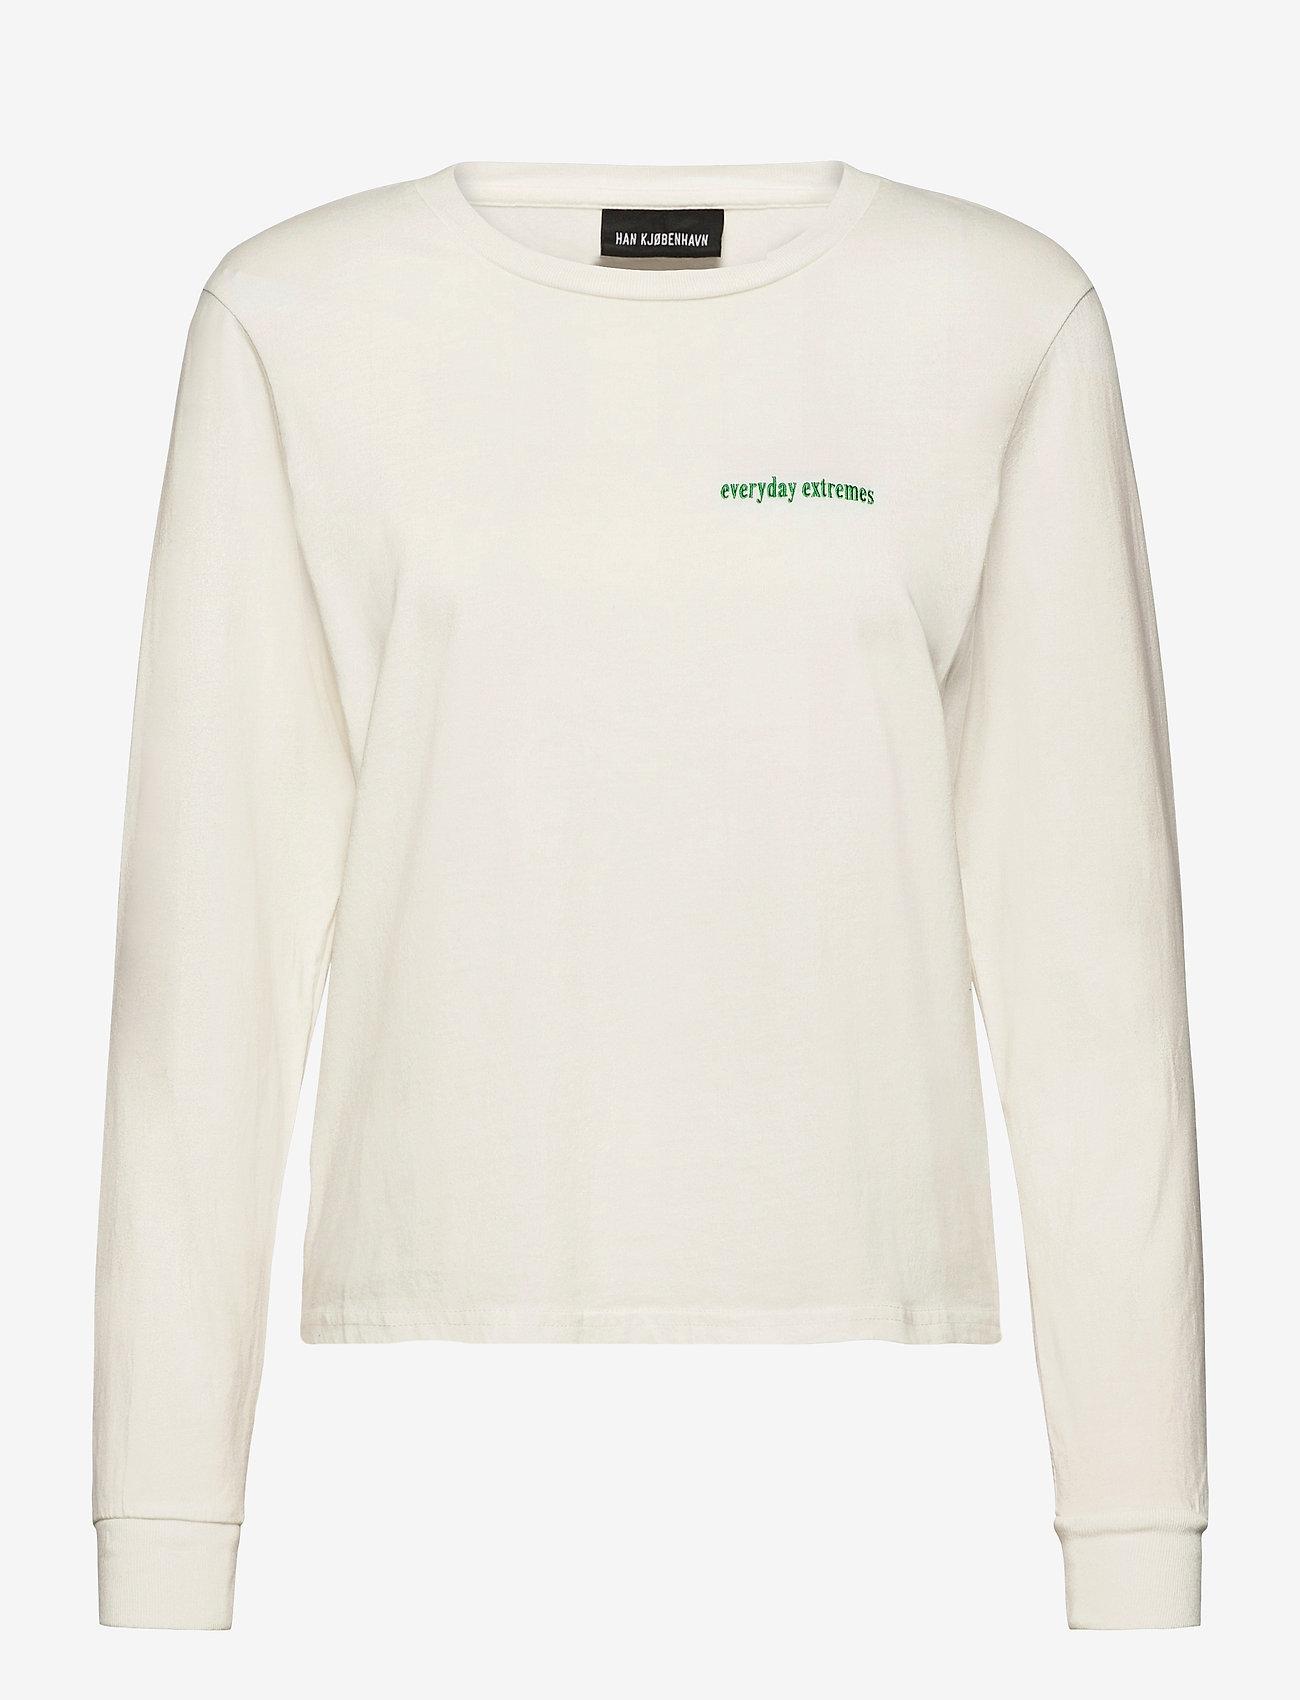 HAN Kjøbenhavn - Artwork Tee Long Sleeve - tops met lange mouwen - off white - 0